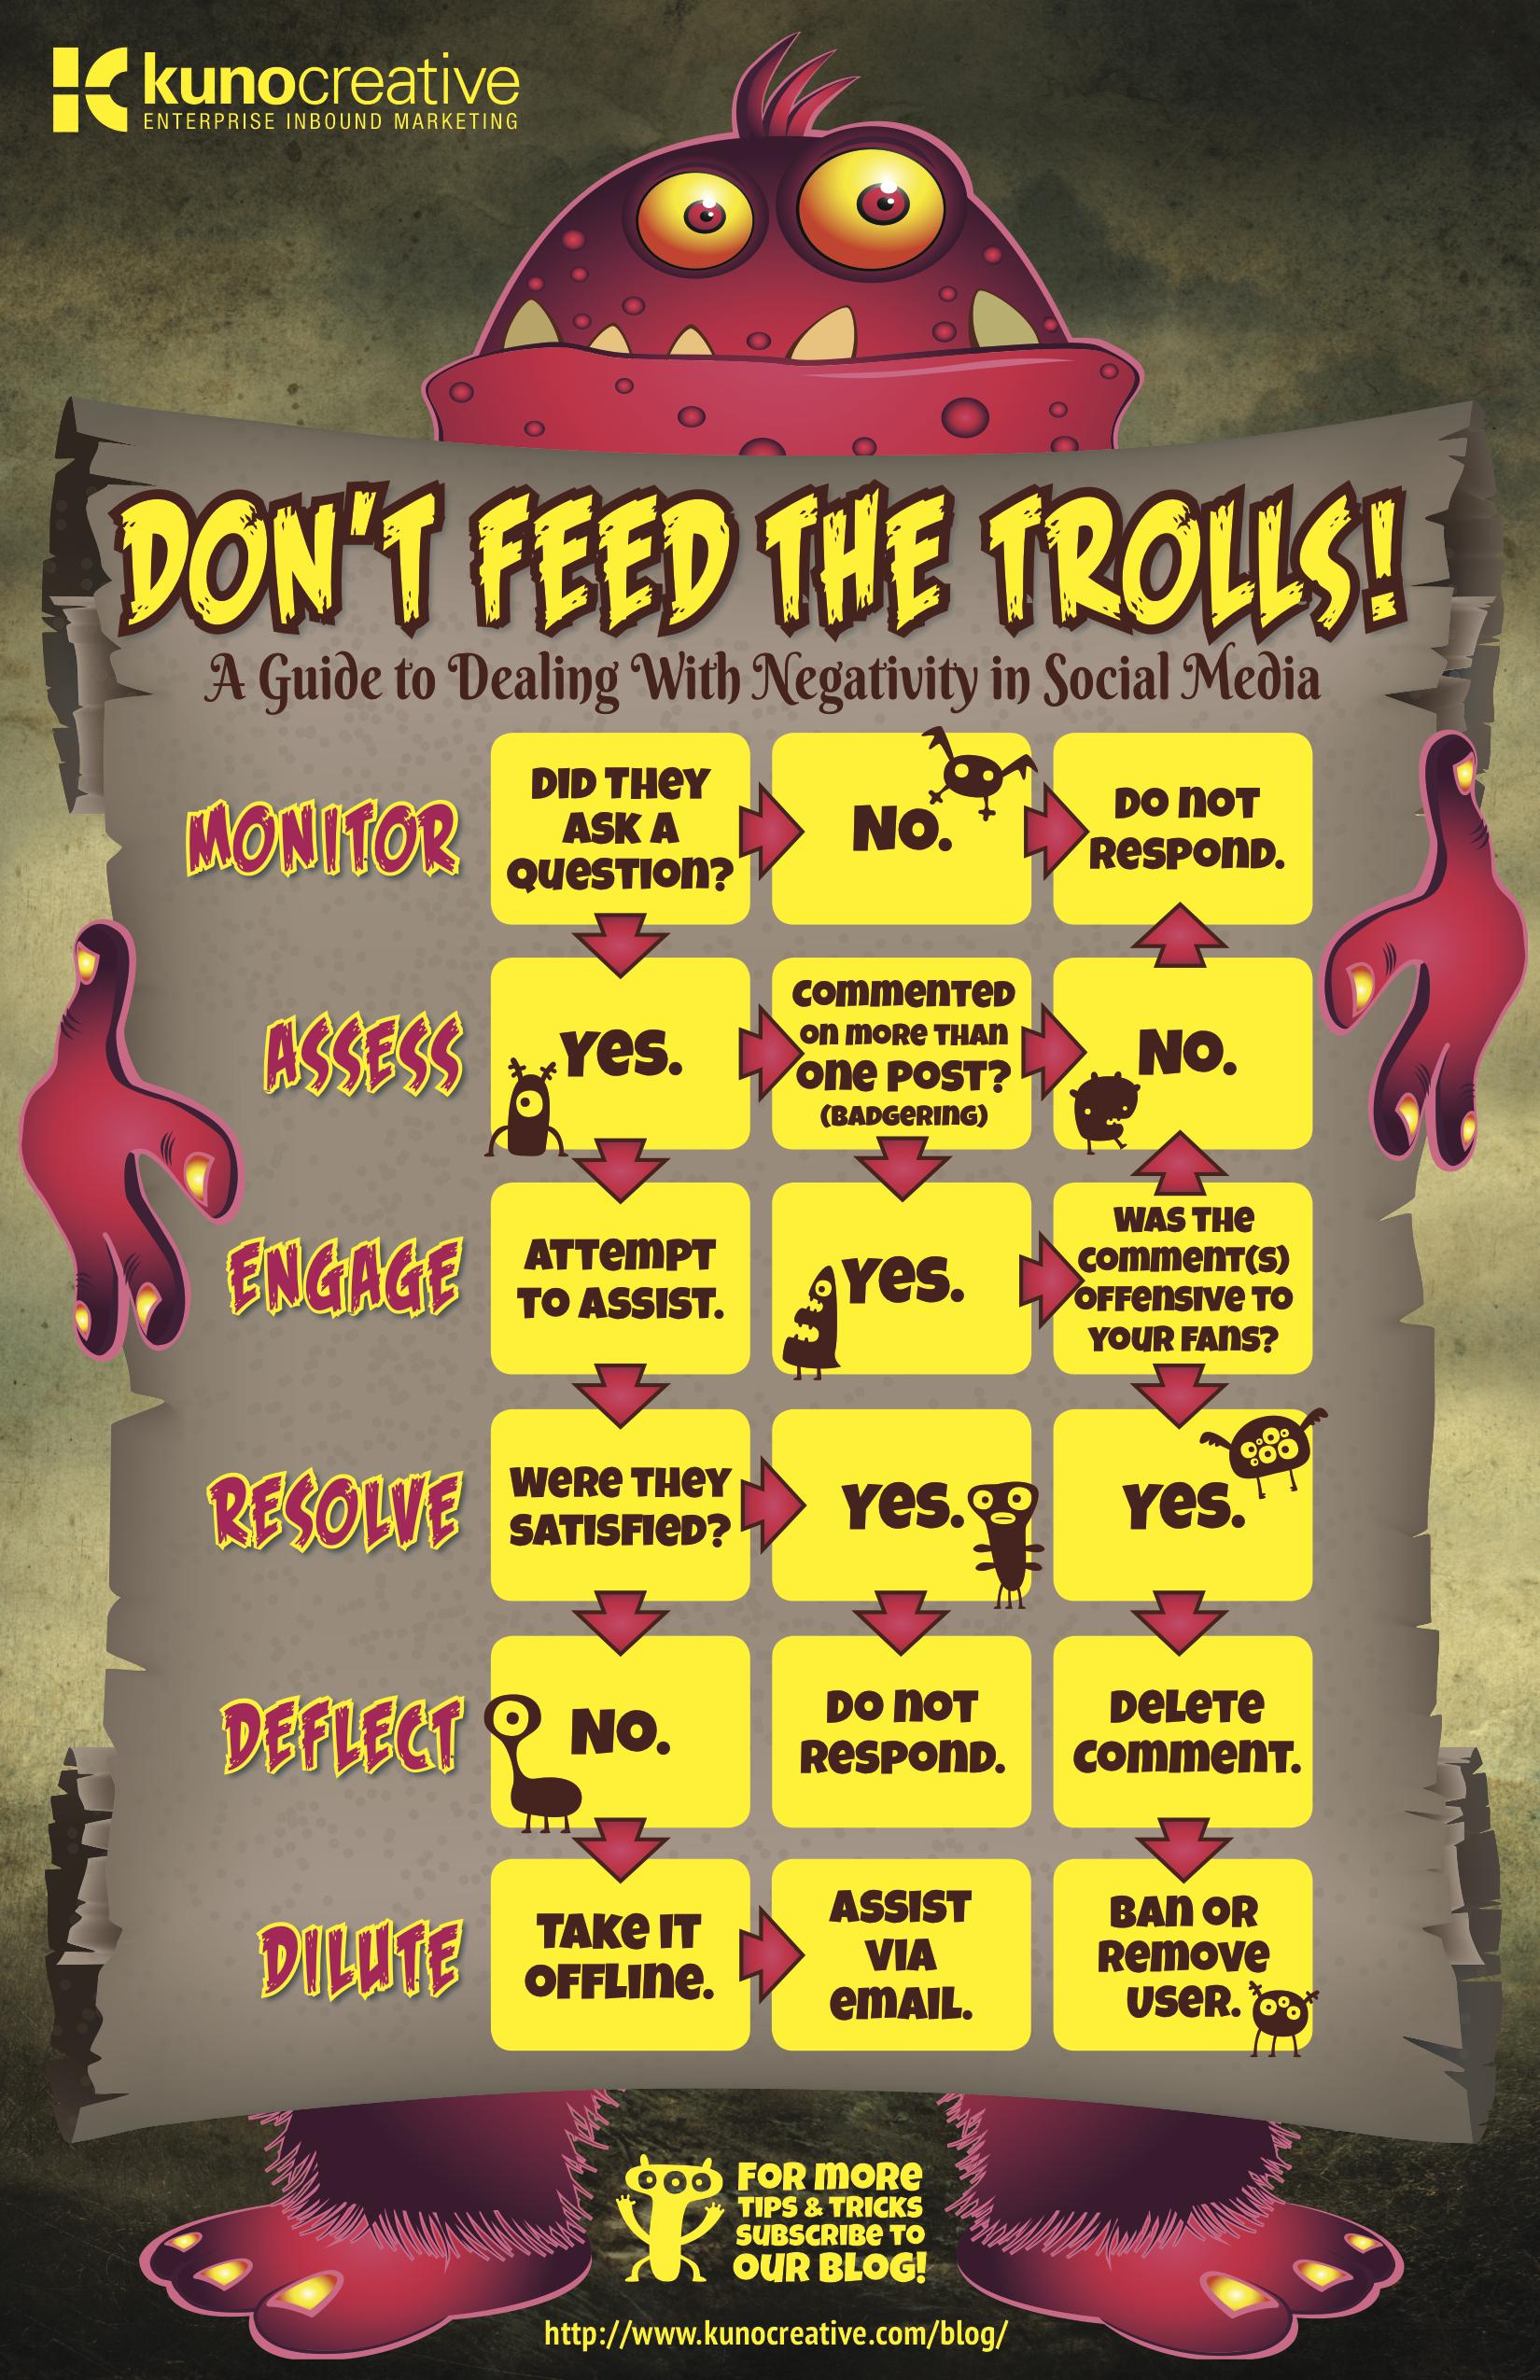 kuno creative troll infographic